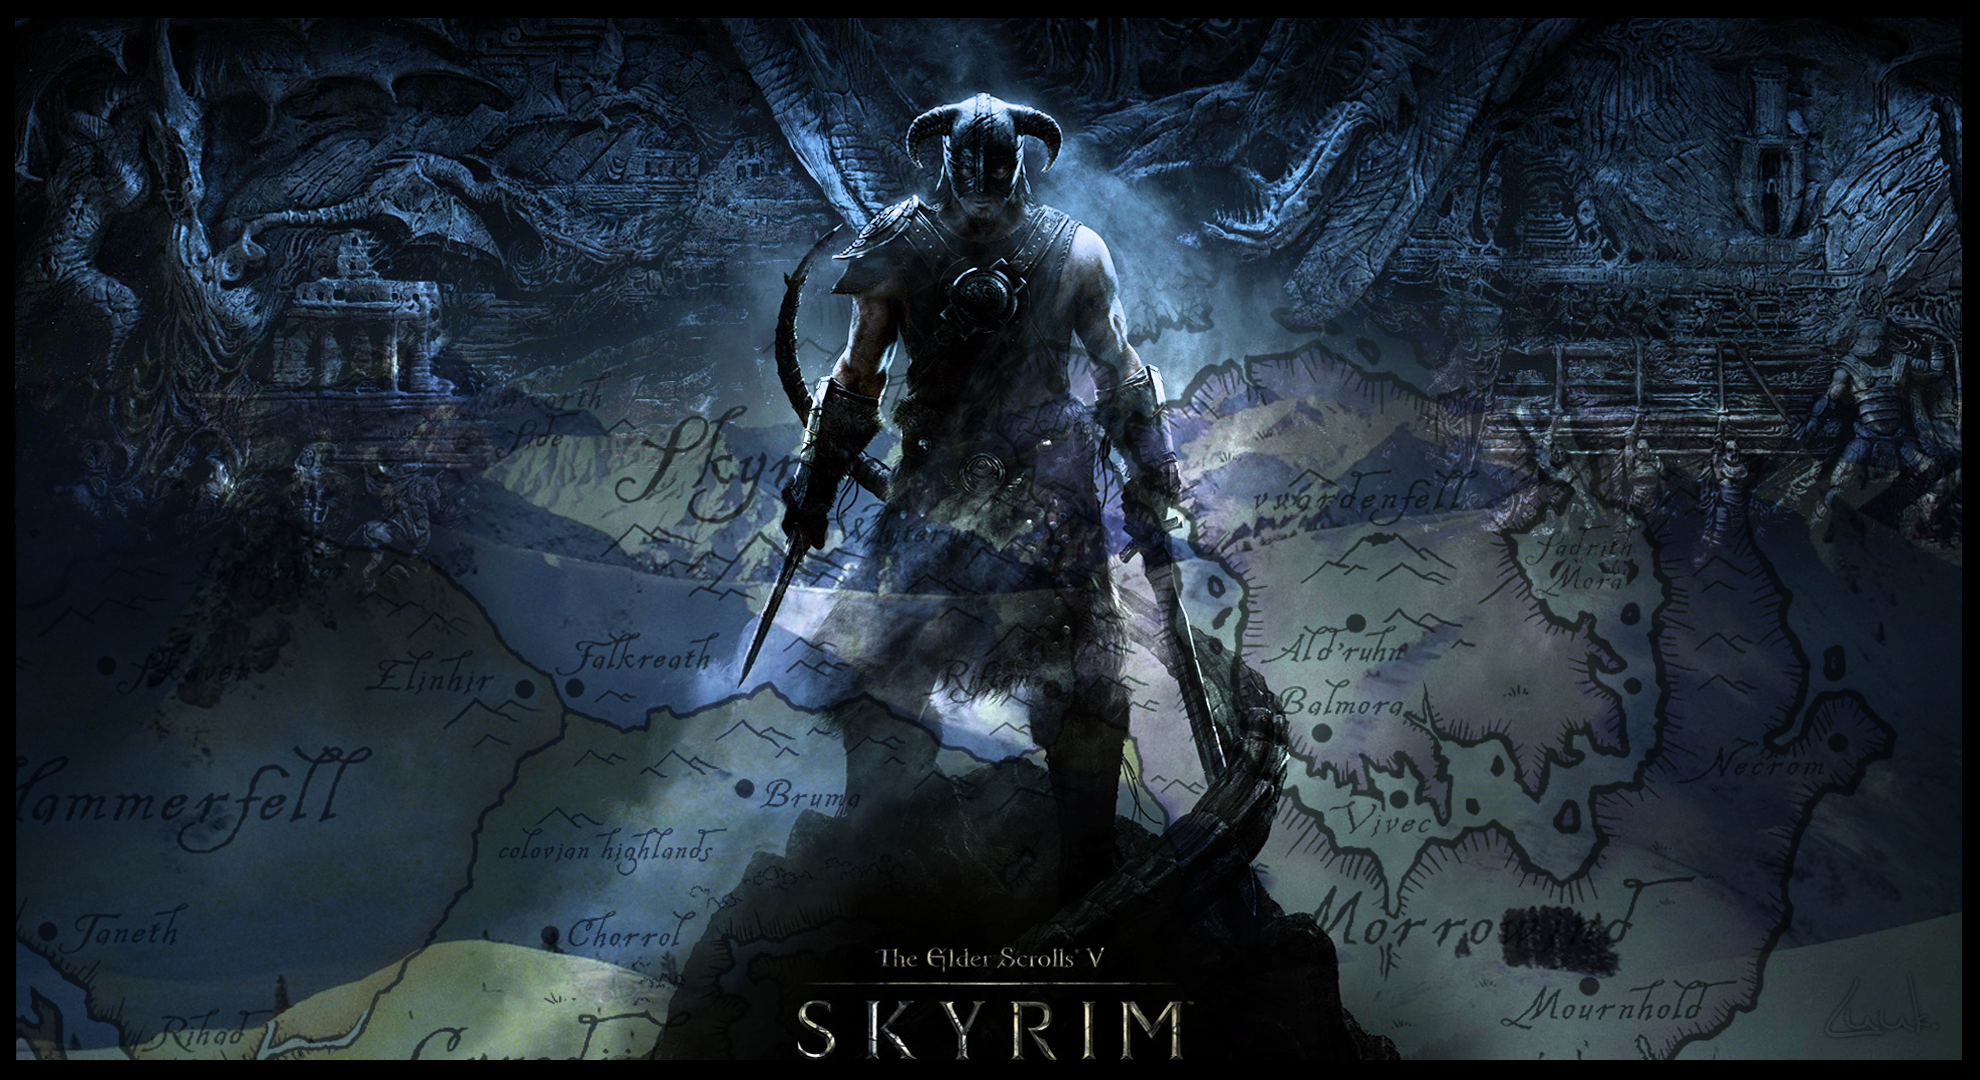 skyrim wallpaper image mod - photo #12